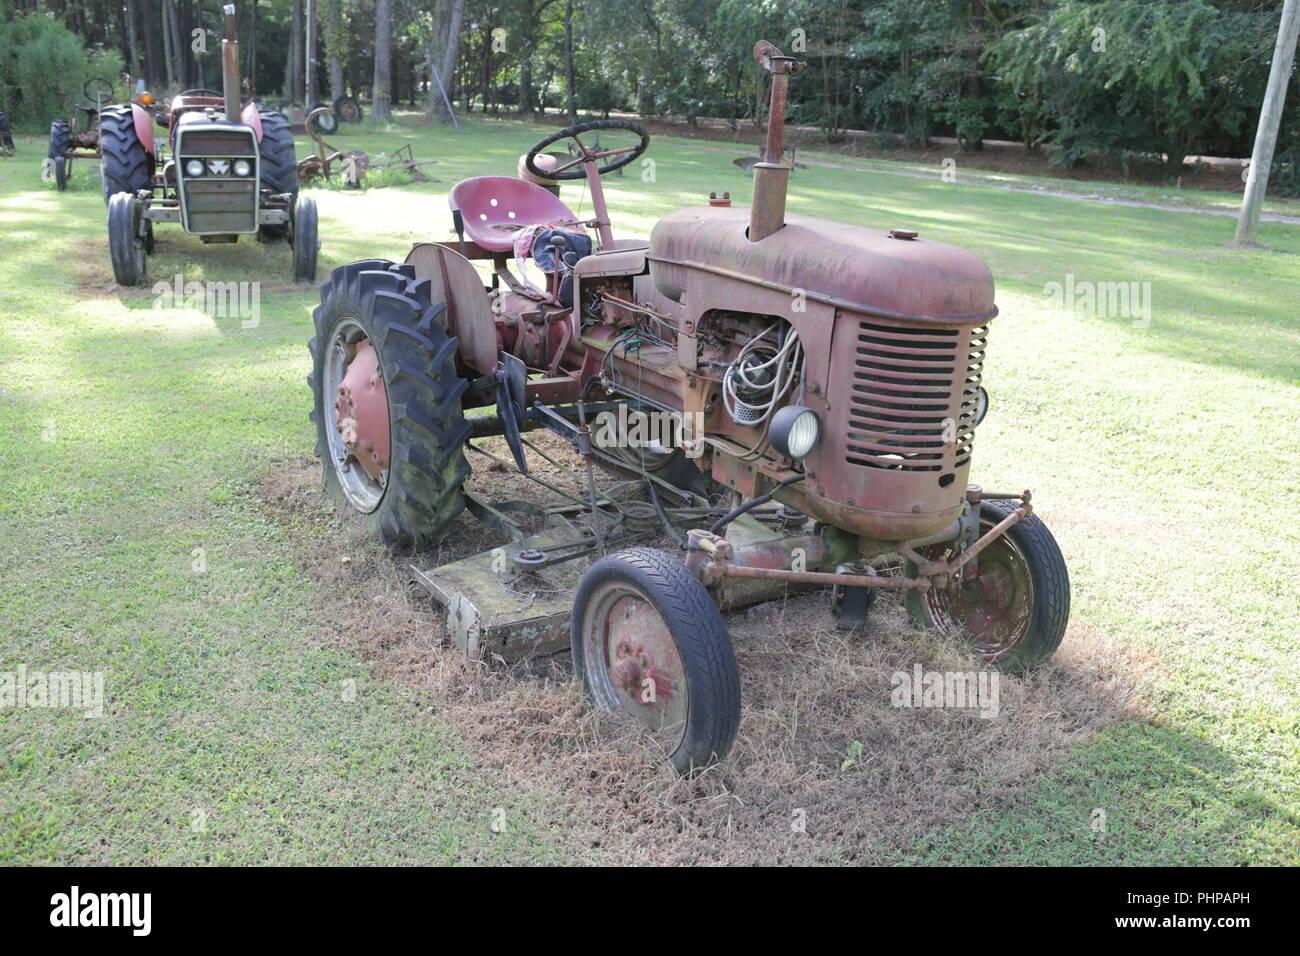 old rusty tractors in junkyard - Stock Image